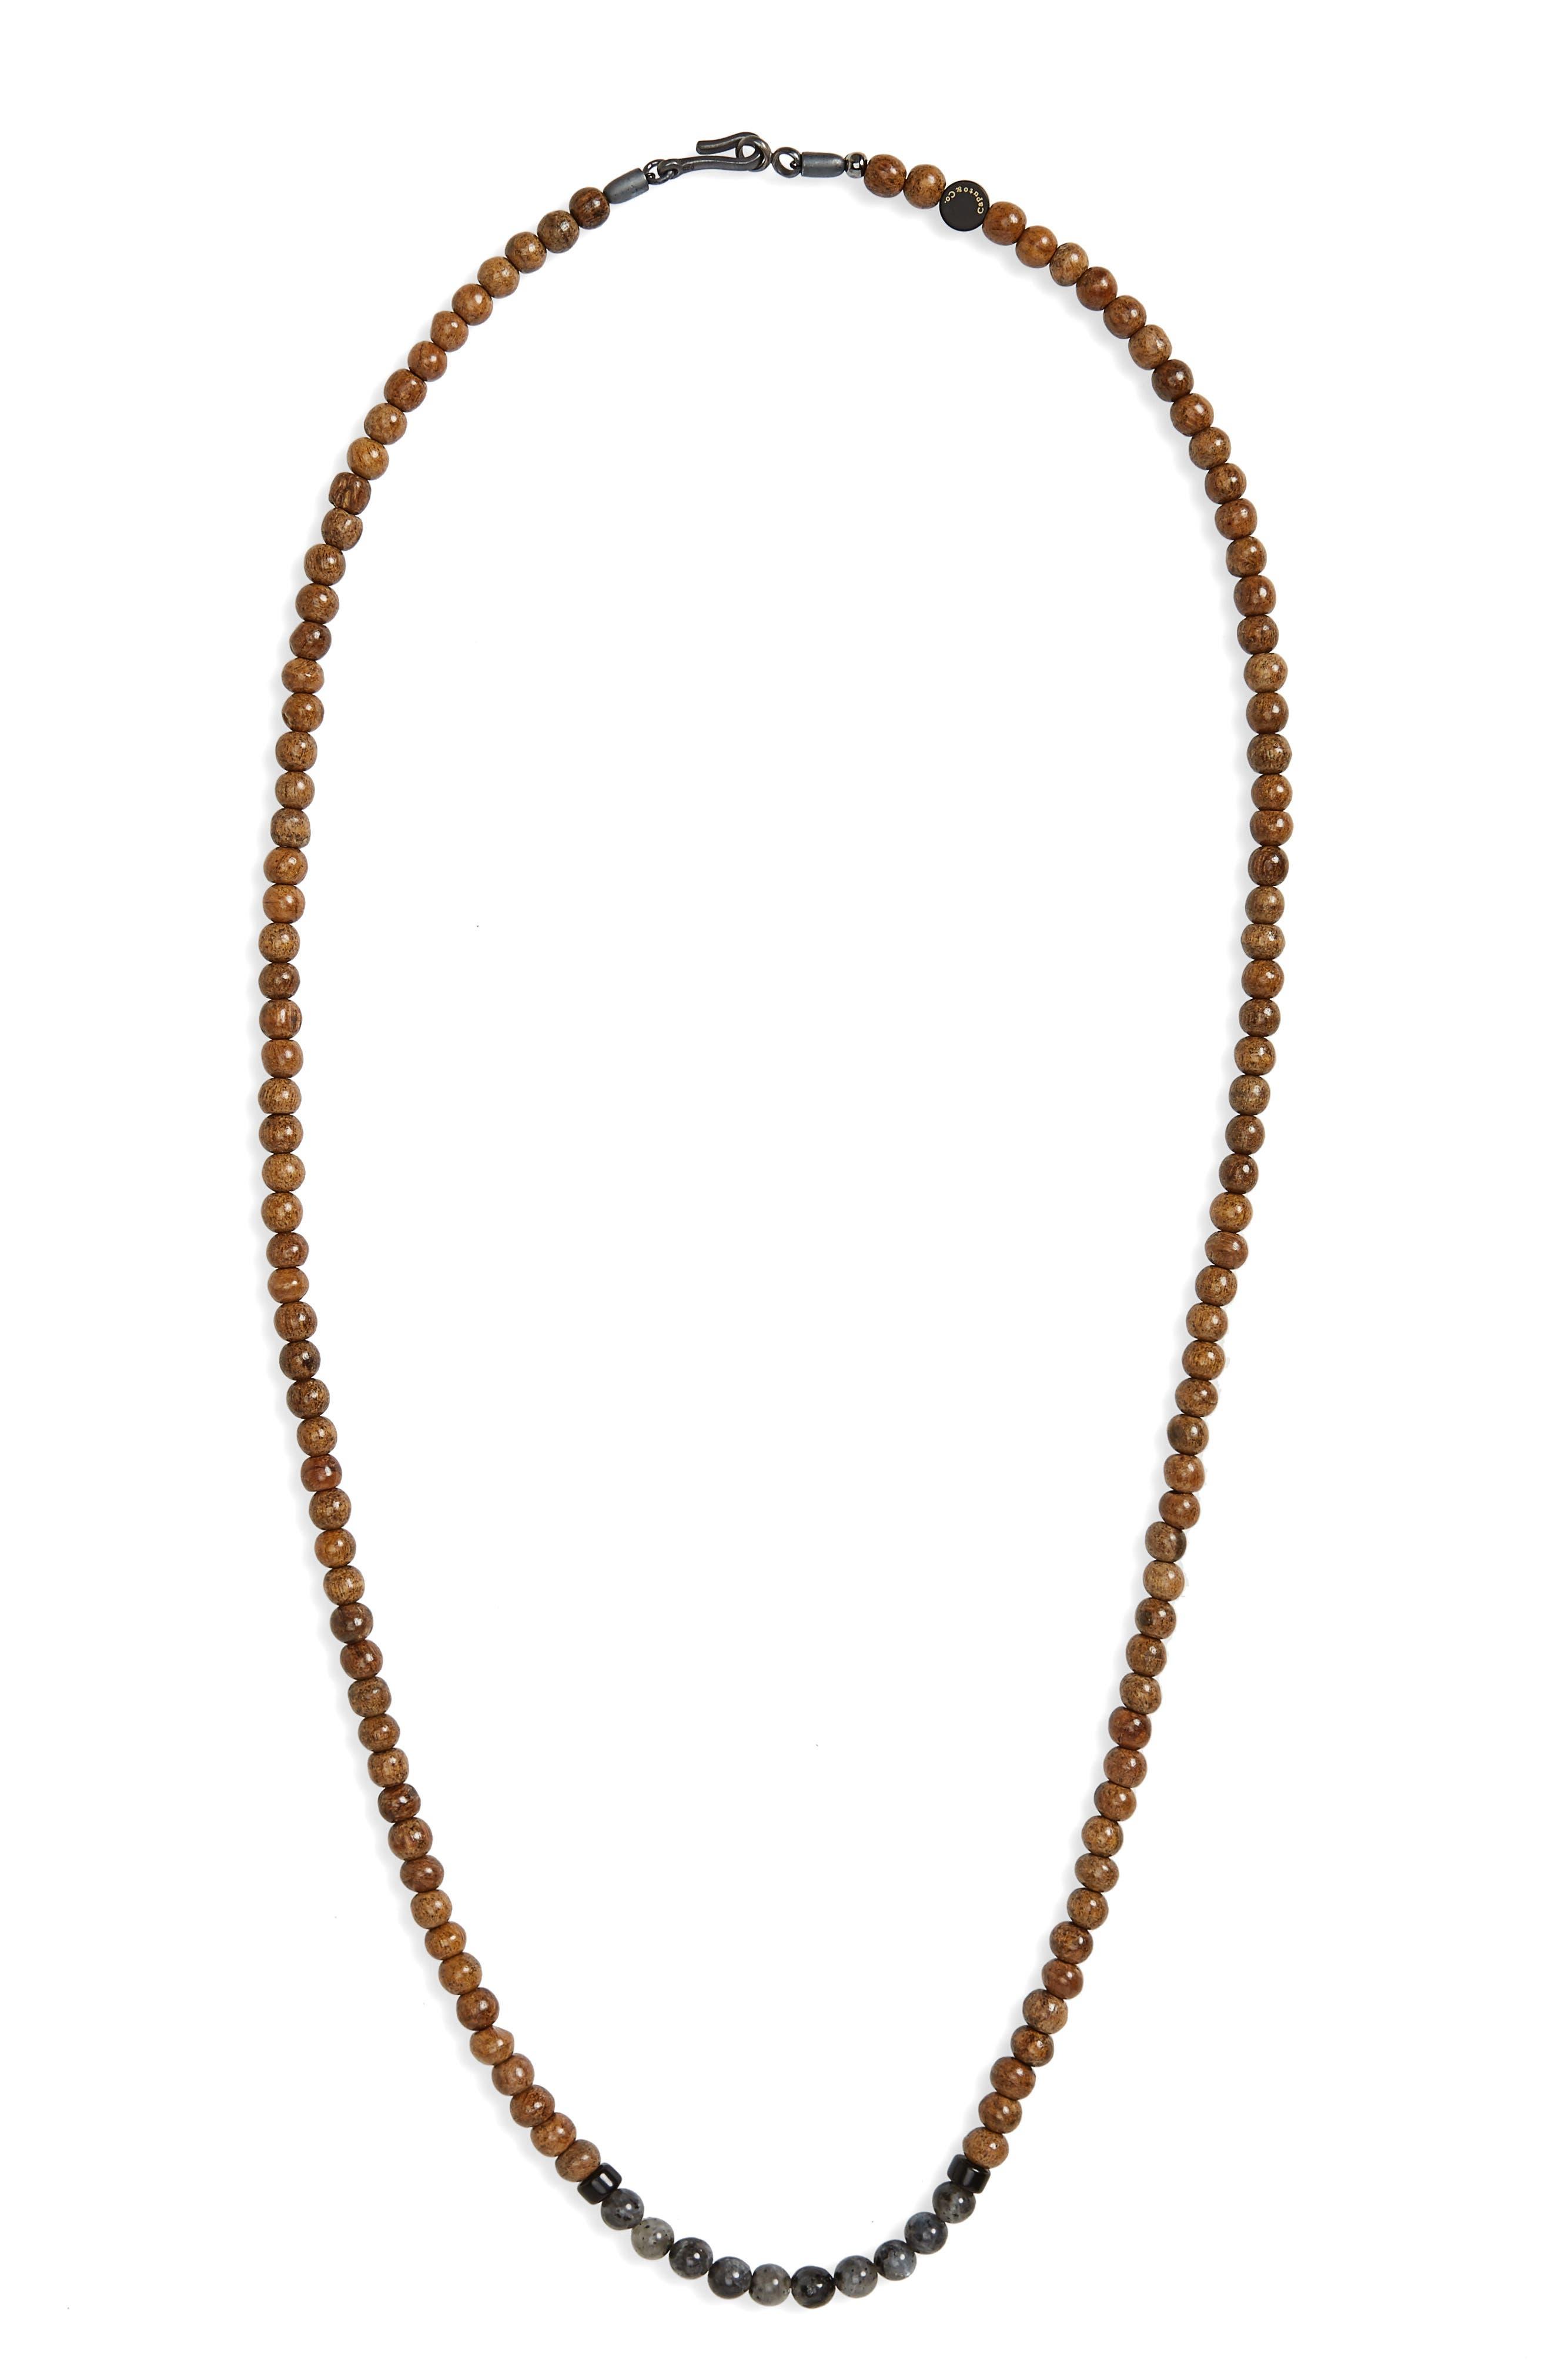 Ubud Stone Bead Necklace,                         Main,                         color, Black Labradorite